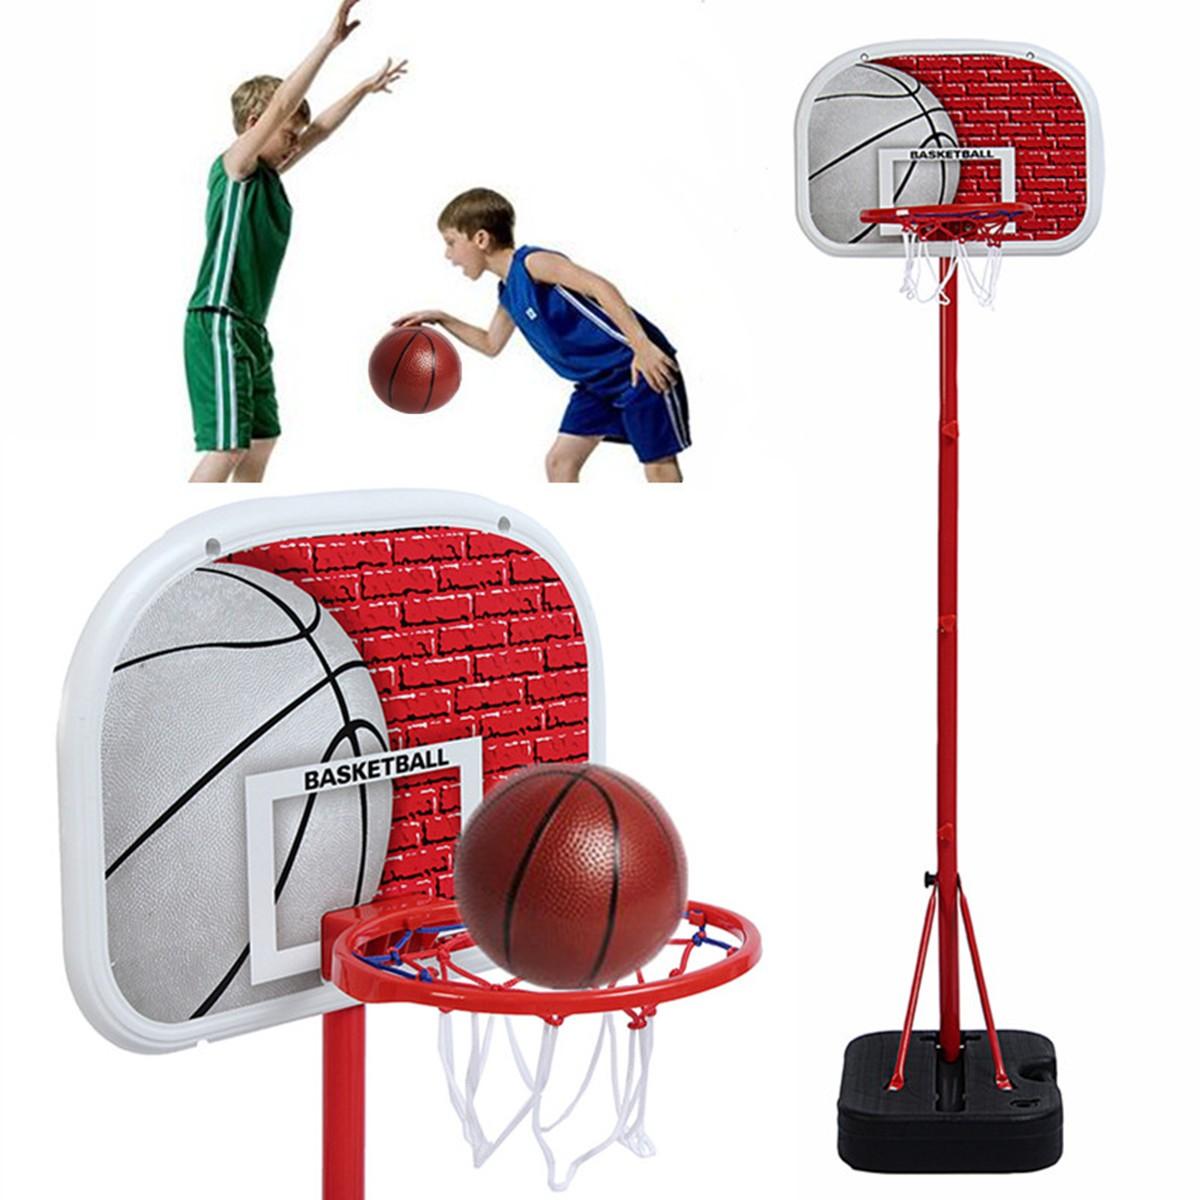 1 Set Adjustable Basketball Hoop System Stand Net Goal Backboard +Basketball+Base+Pole+Ring+Net Kid Child Gift Indoor... by